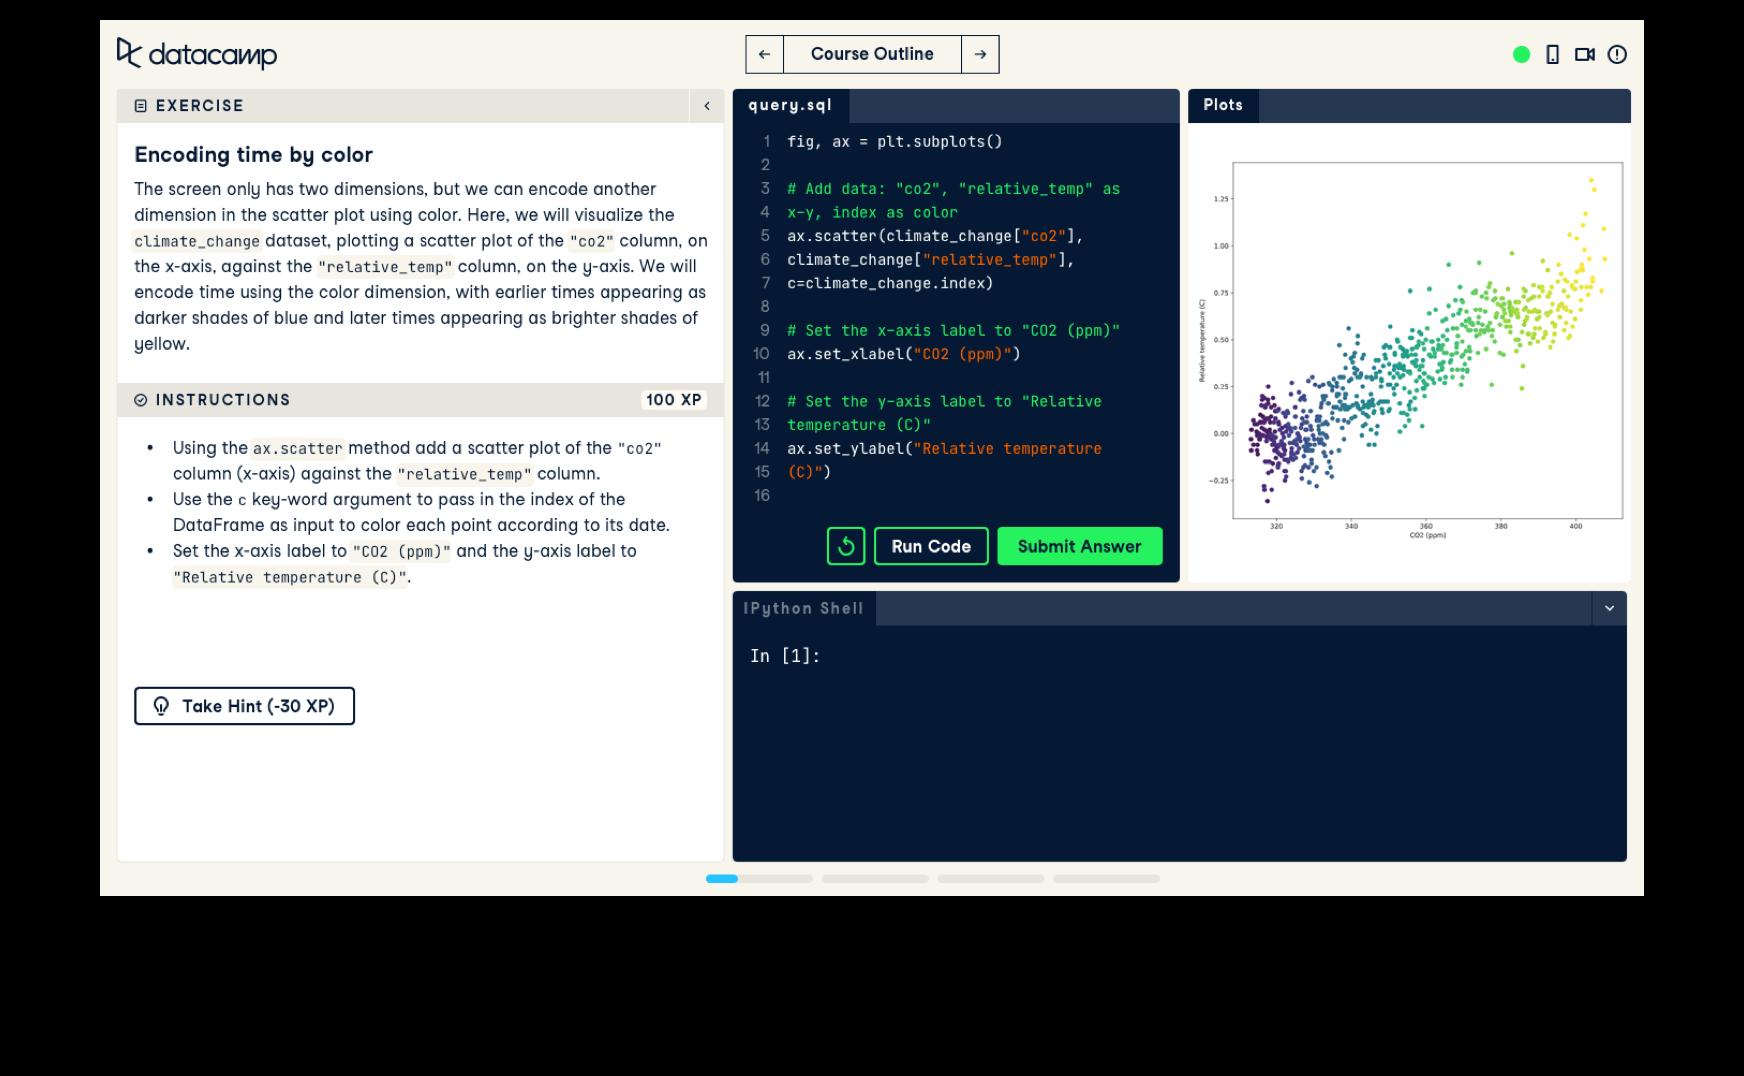 Screenshot of the interactive UI